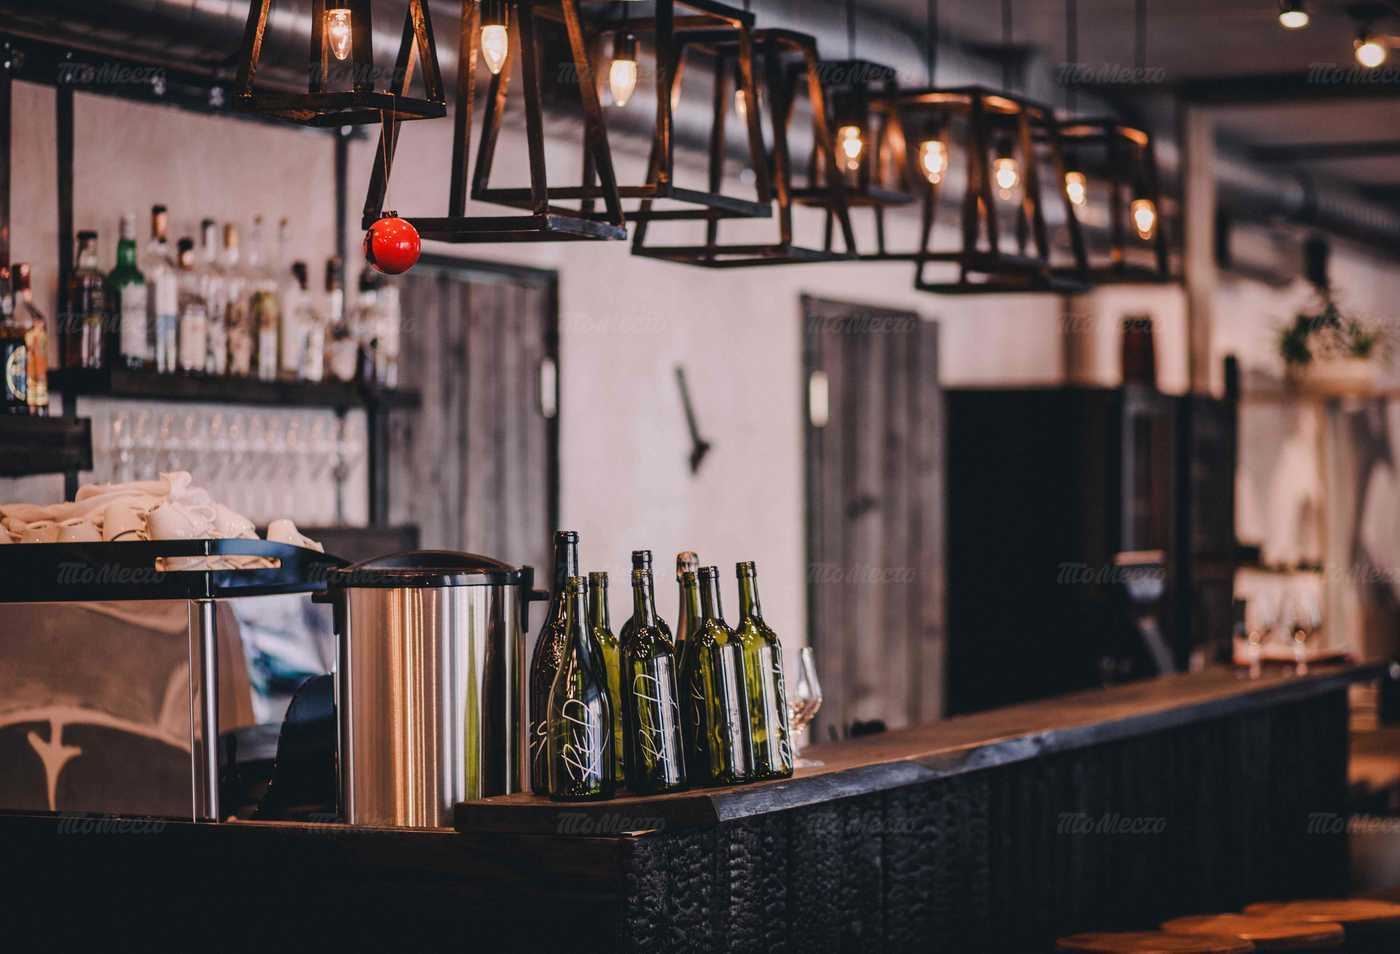 Меню ресторана, стейк-хауса Red. Steak&Wine на улице Ленина